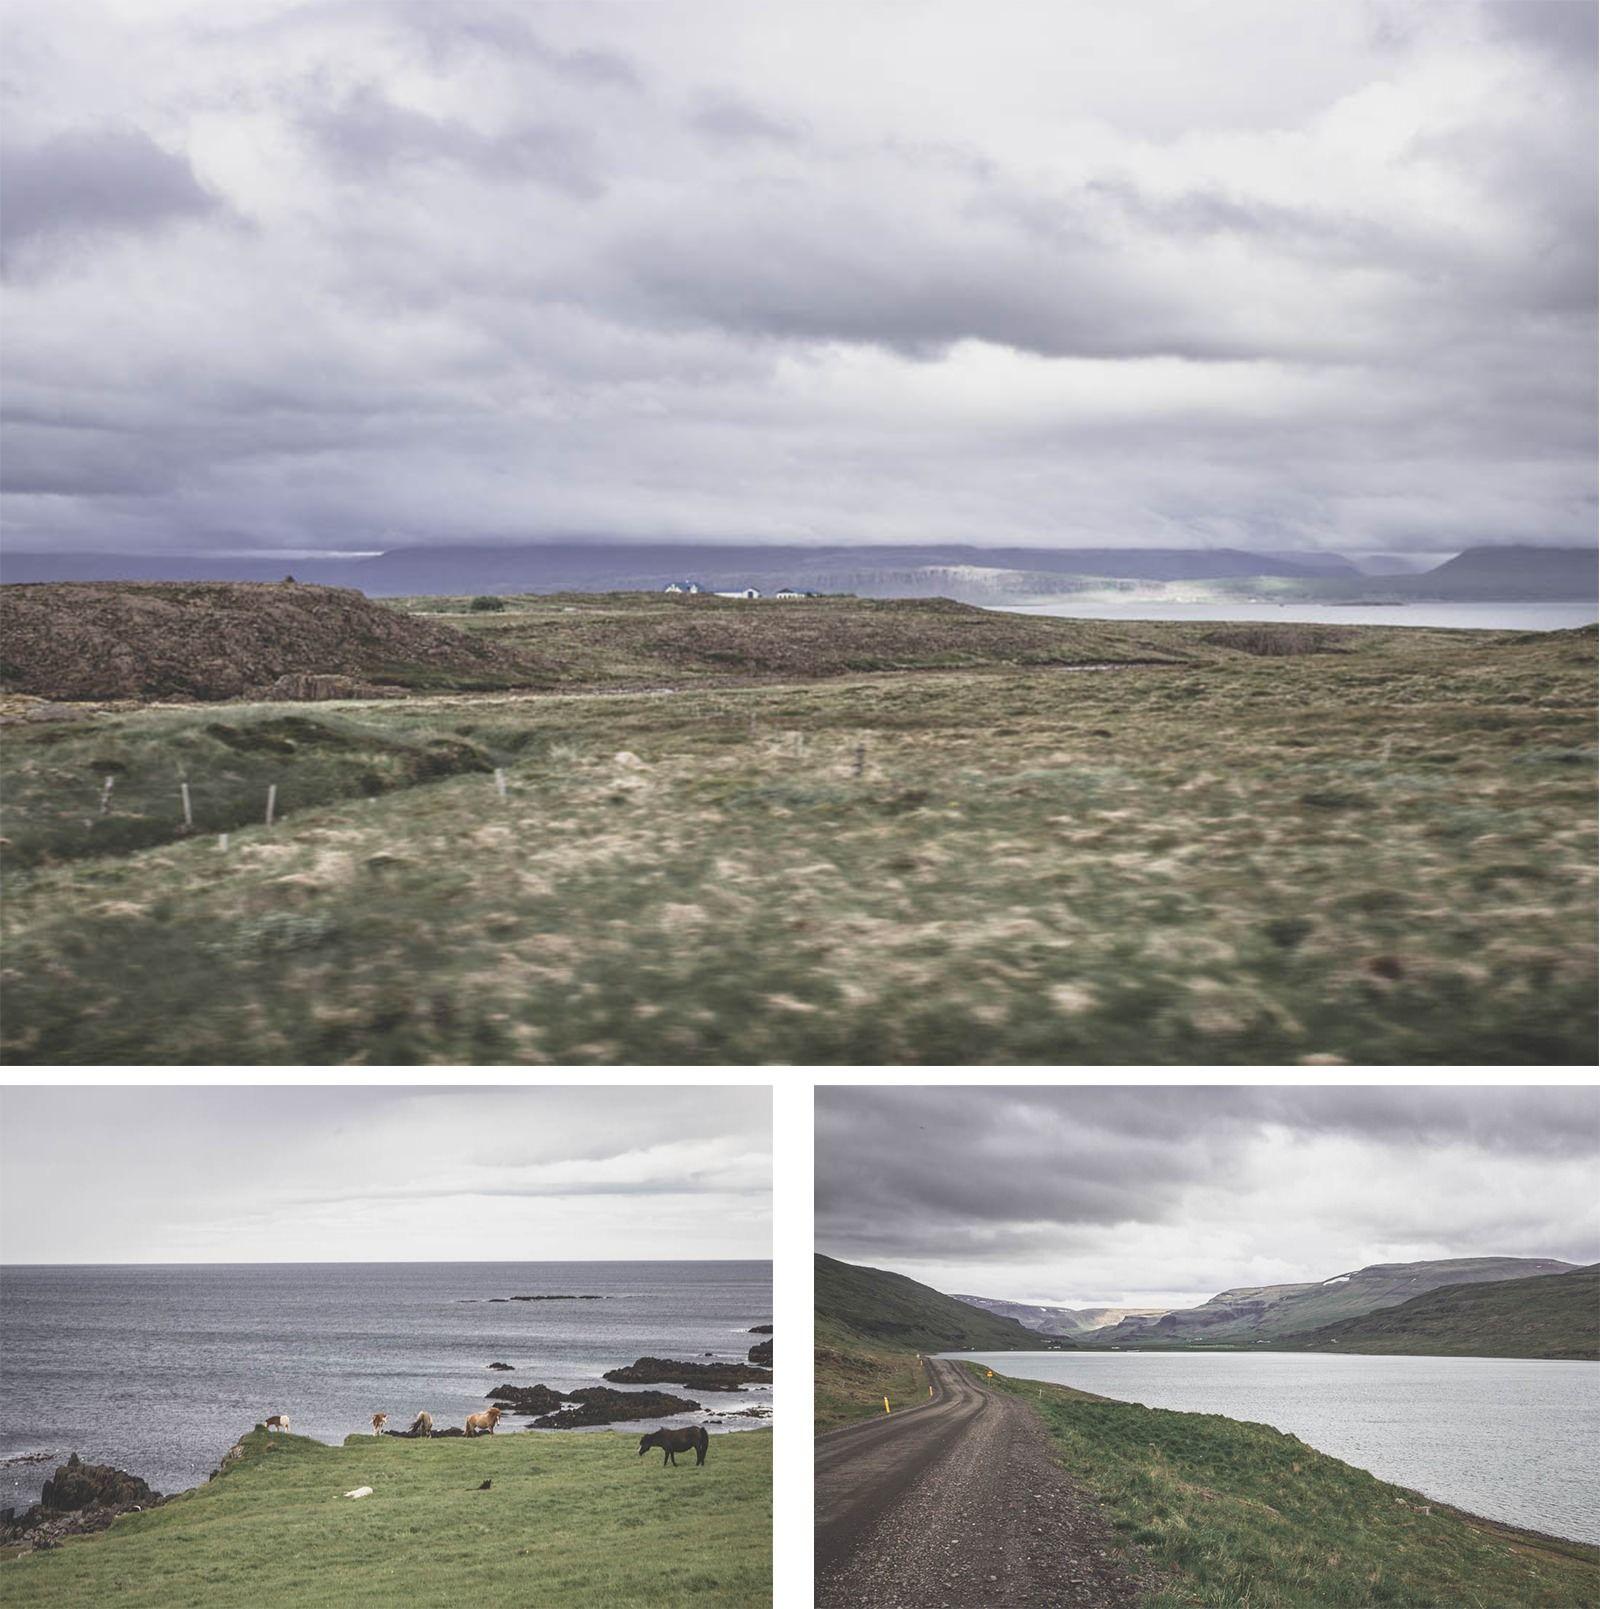 North Iceland / Islande